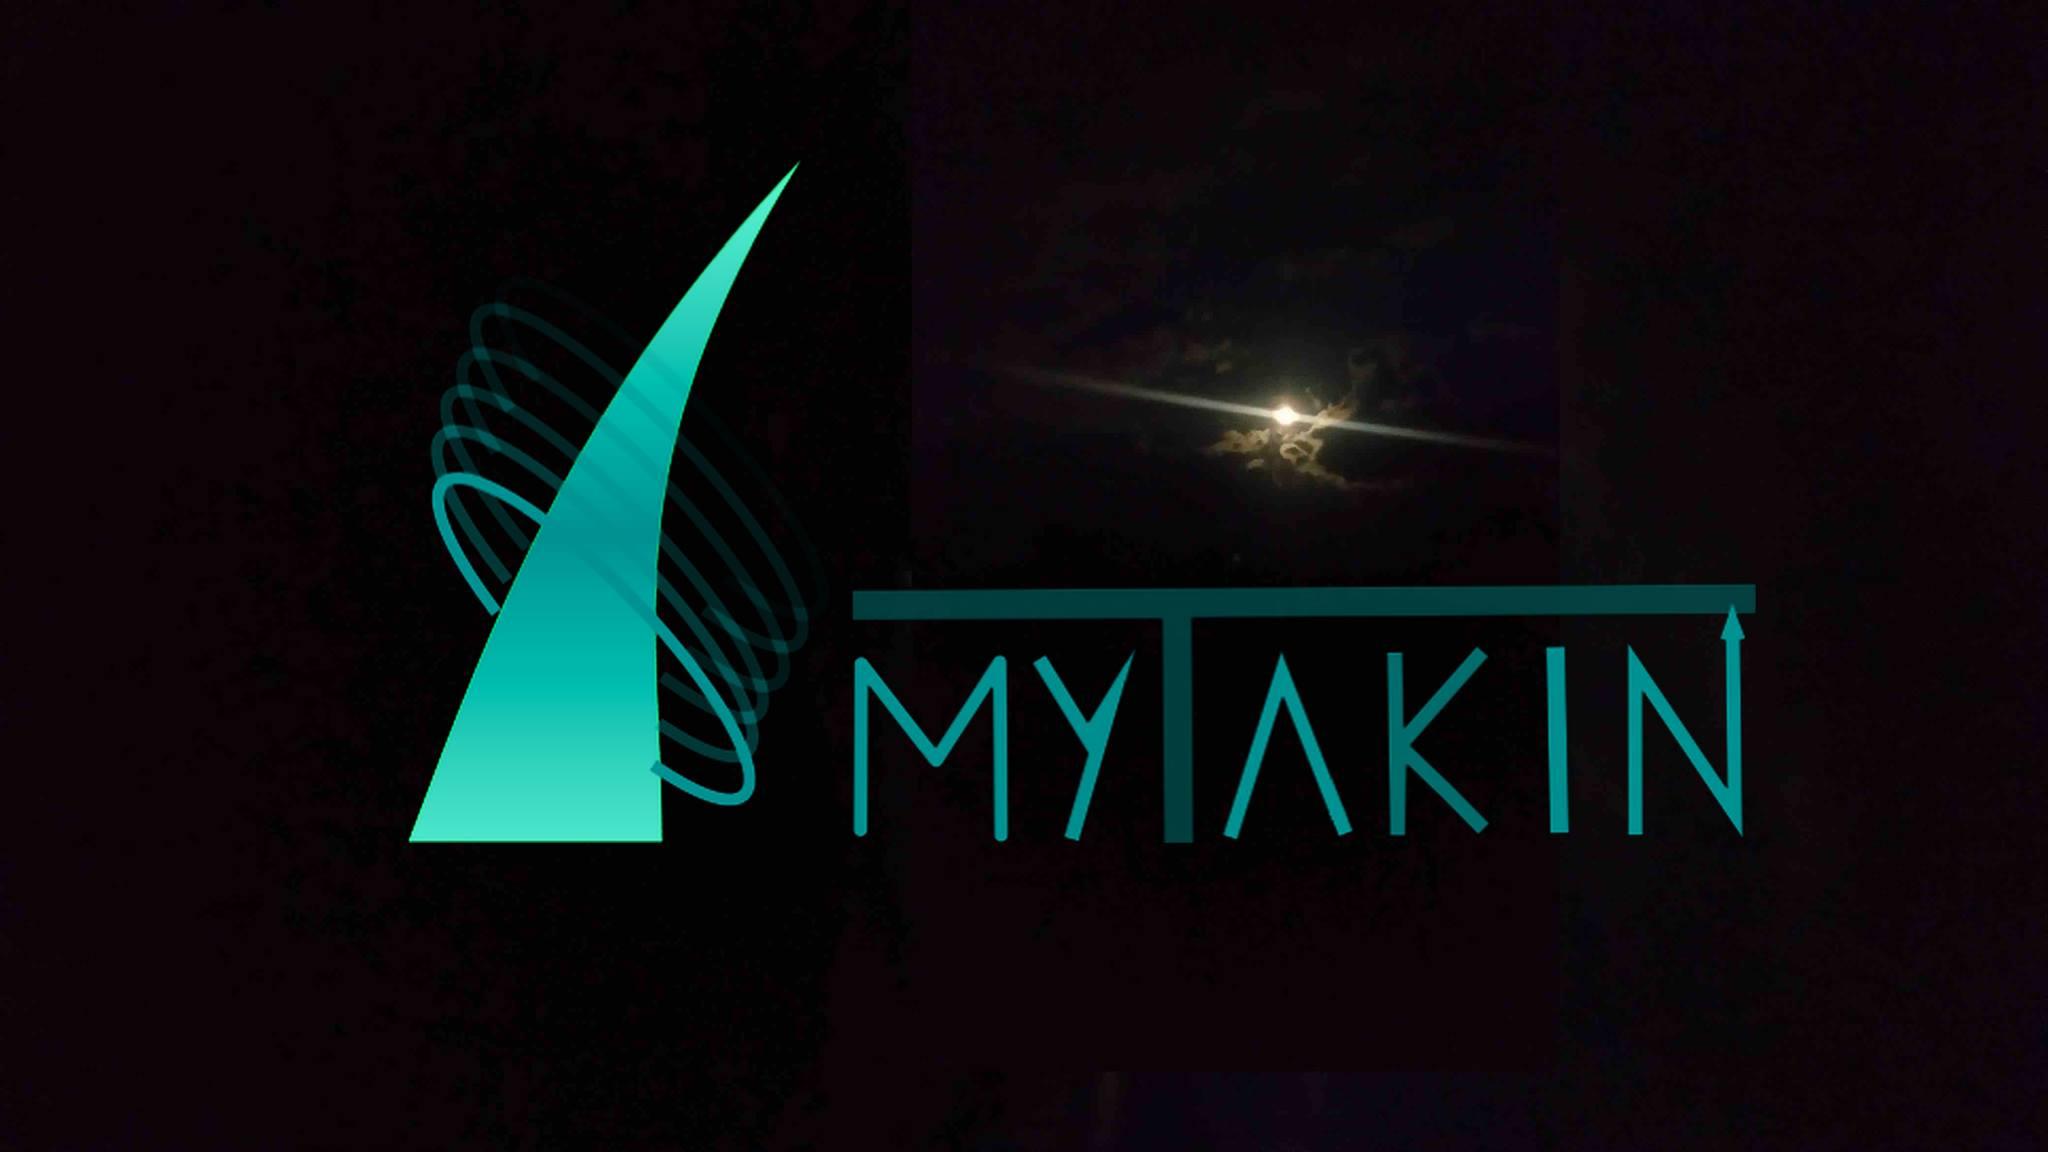 MyTakin